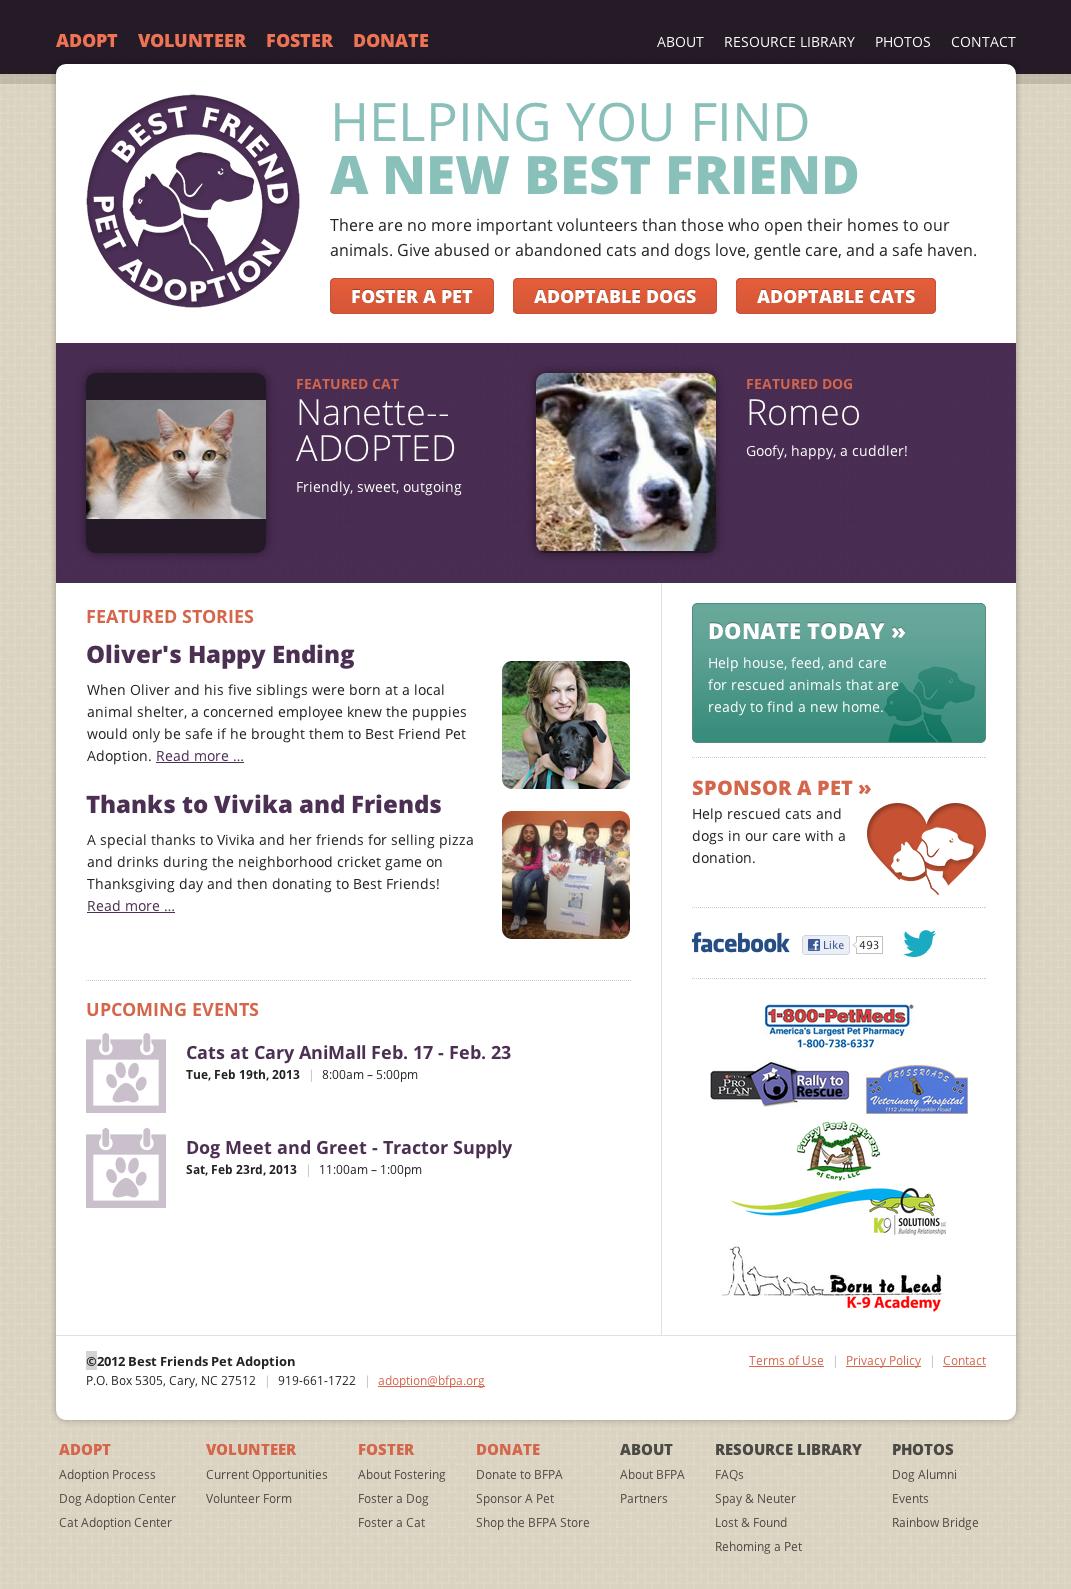 Best Friends Pet Adoption